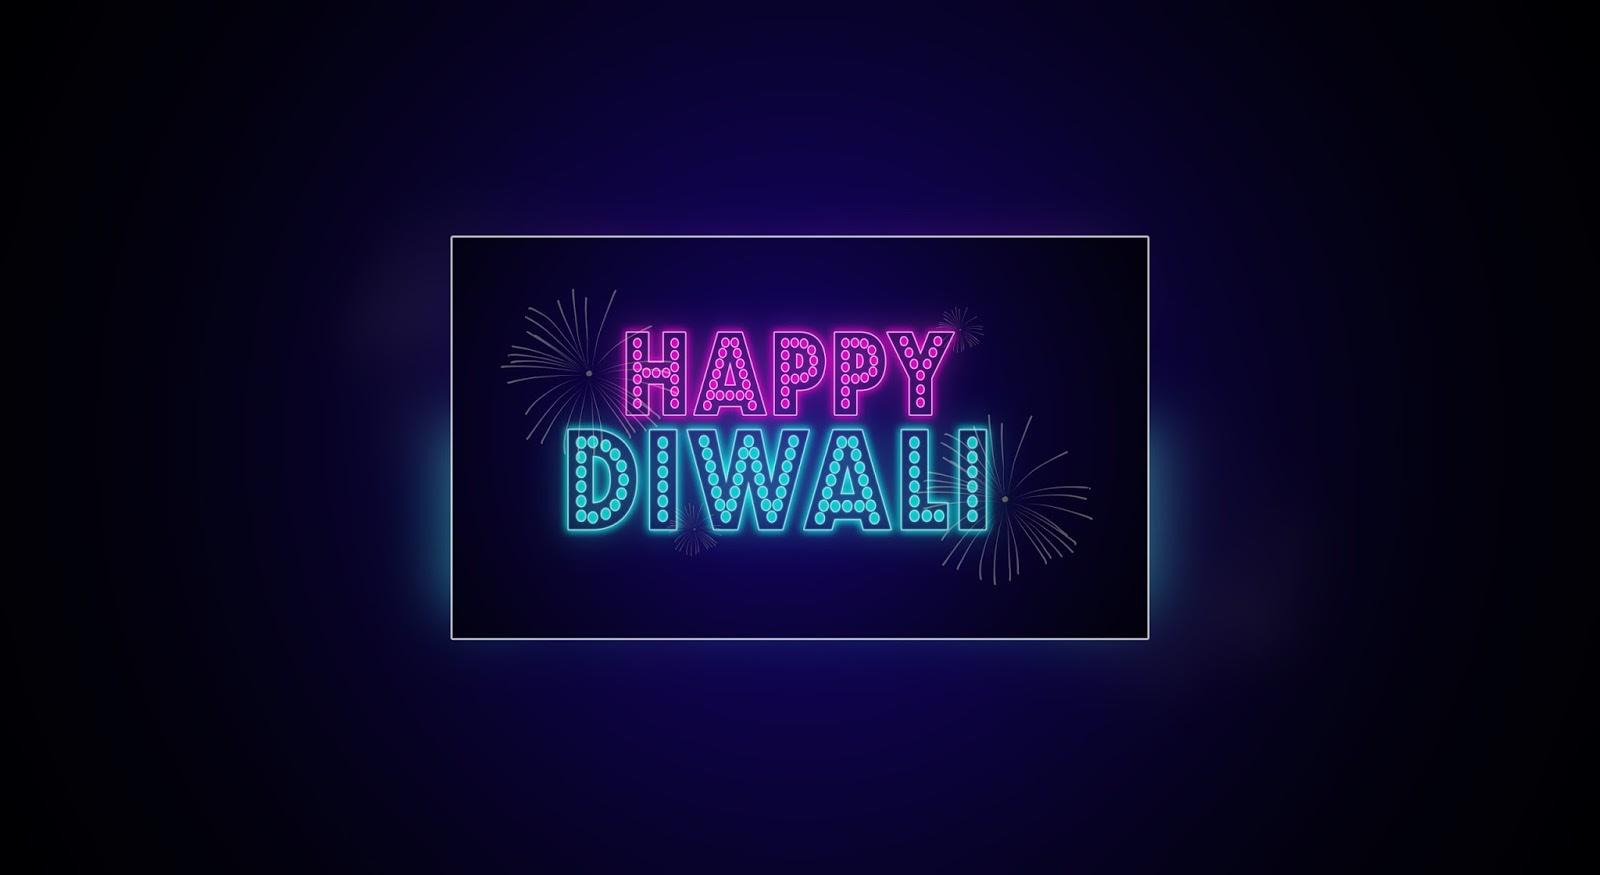 Happy diwali neon light text effect adobe photoshop cc tutorial happy diwali neon light text effect adobe photoshop cc tutorial photoshop cc 2017 baditri Choice Image